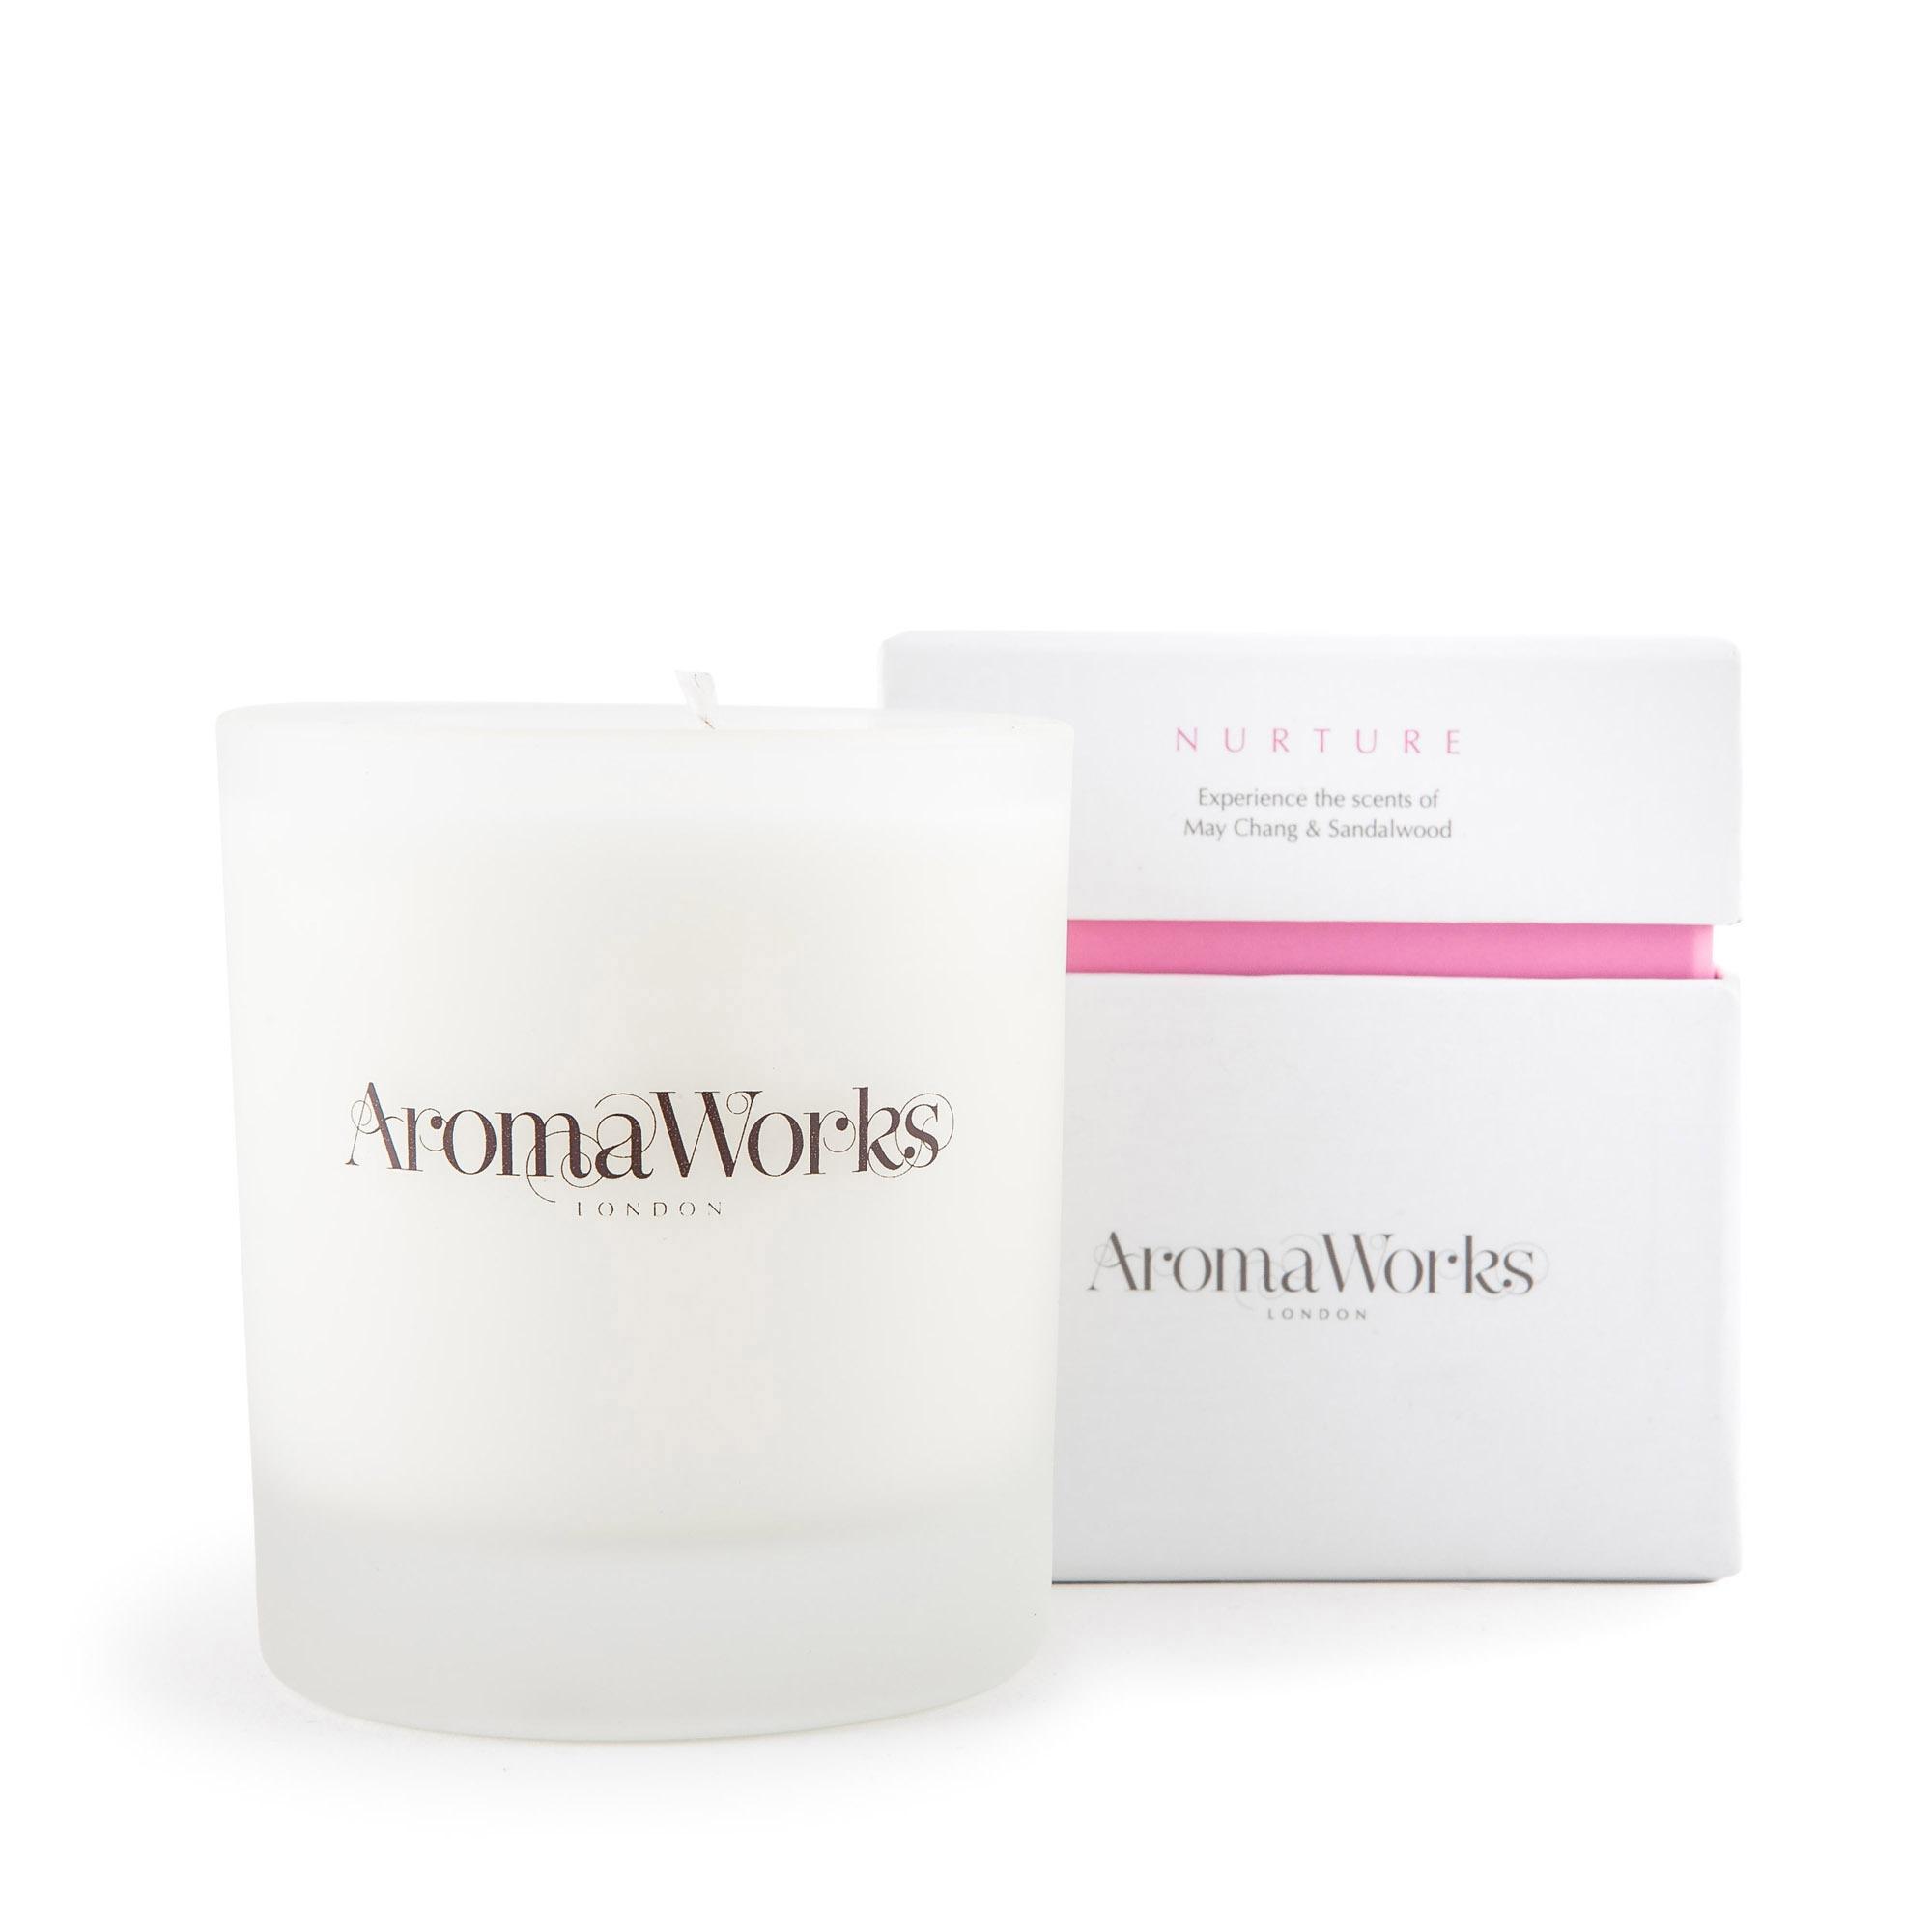 AromaWorks – Medium 'Nurture' scented jar candle